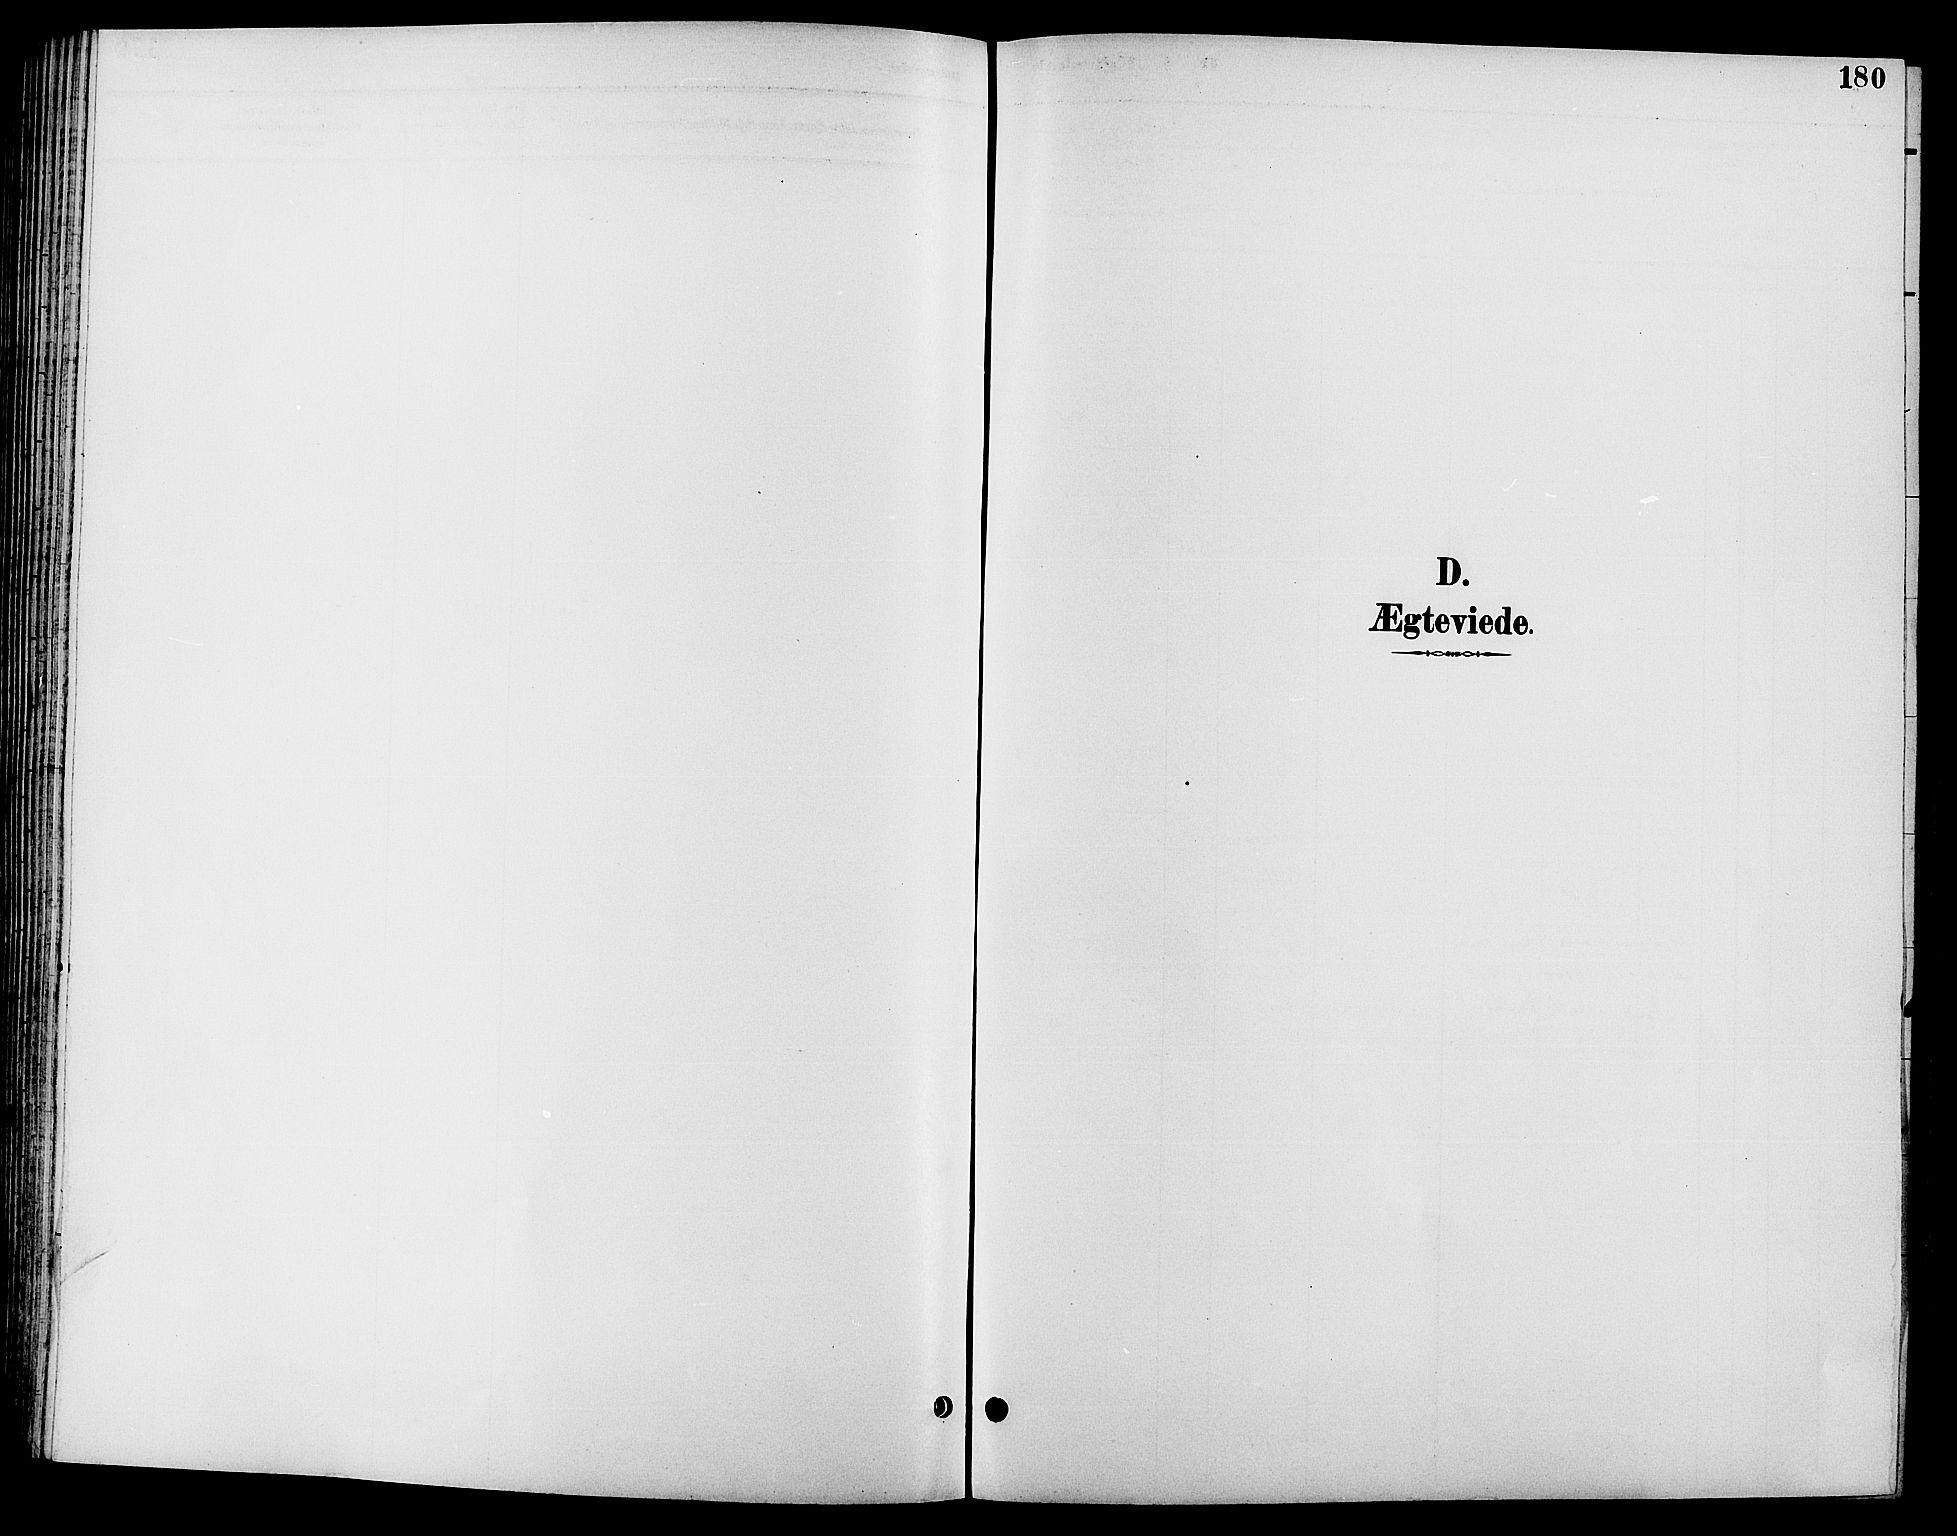 SAH, Biri prestekontor, Klokkerbok nr. 4, 1892-1909, s. 180